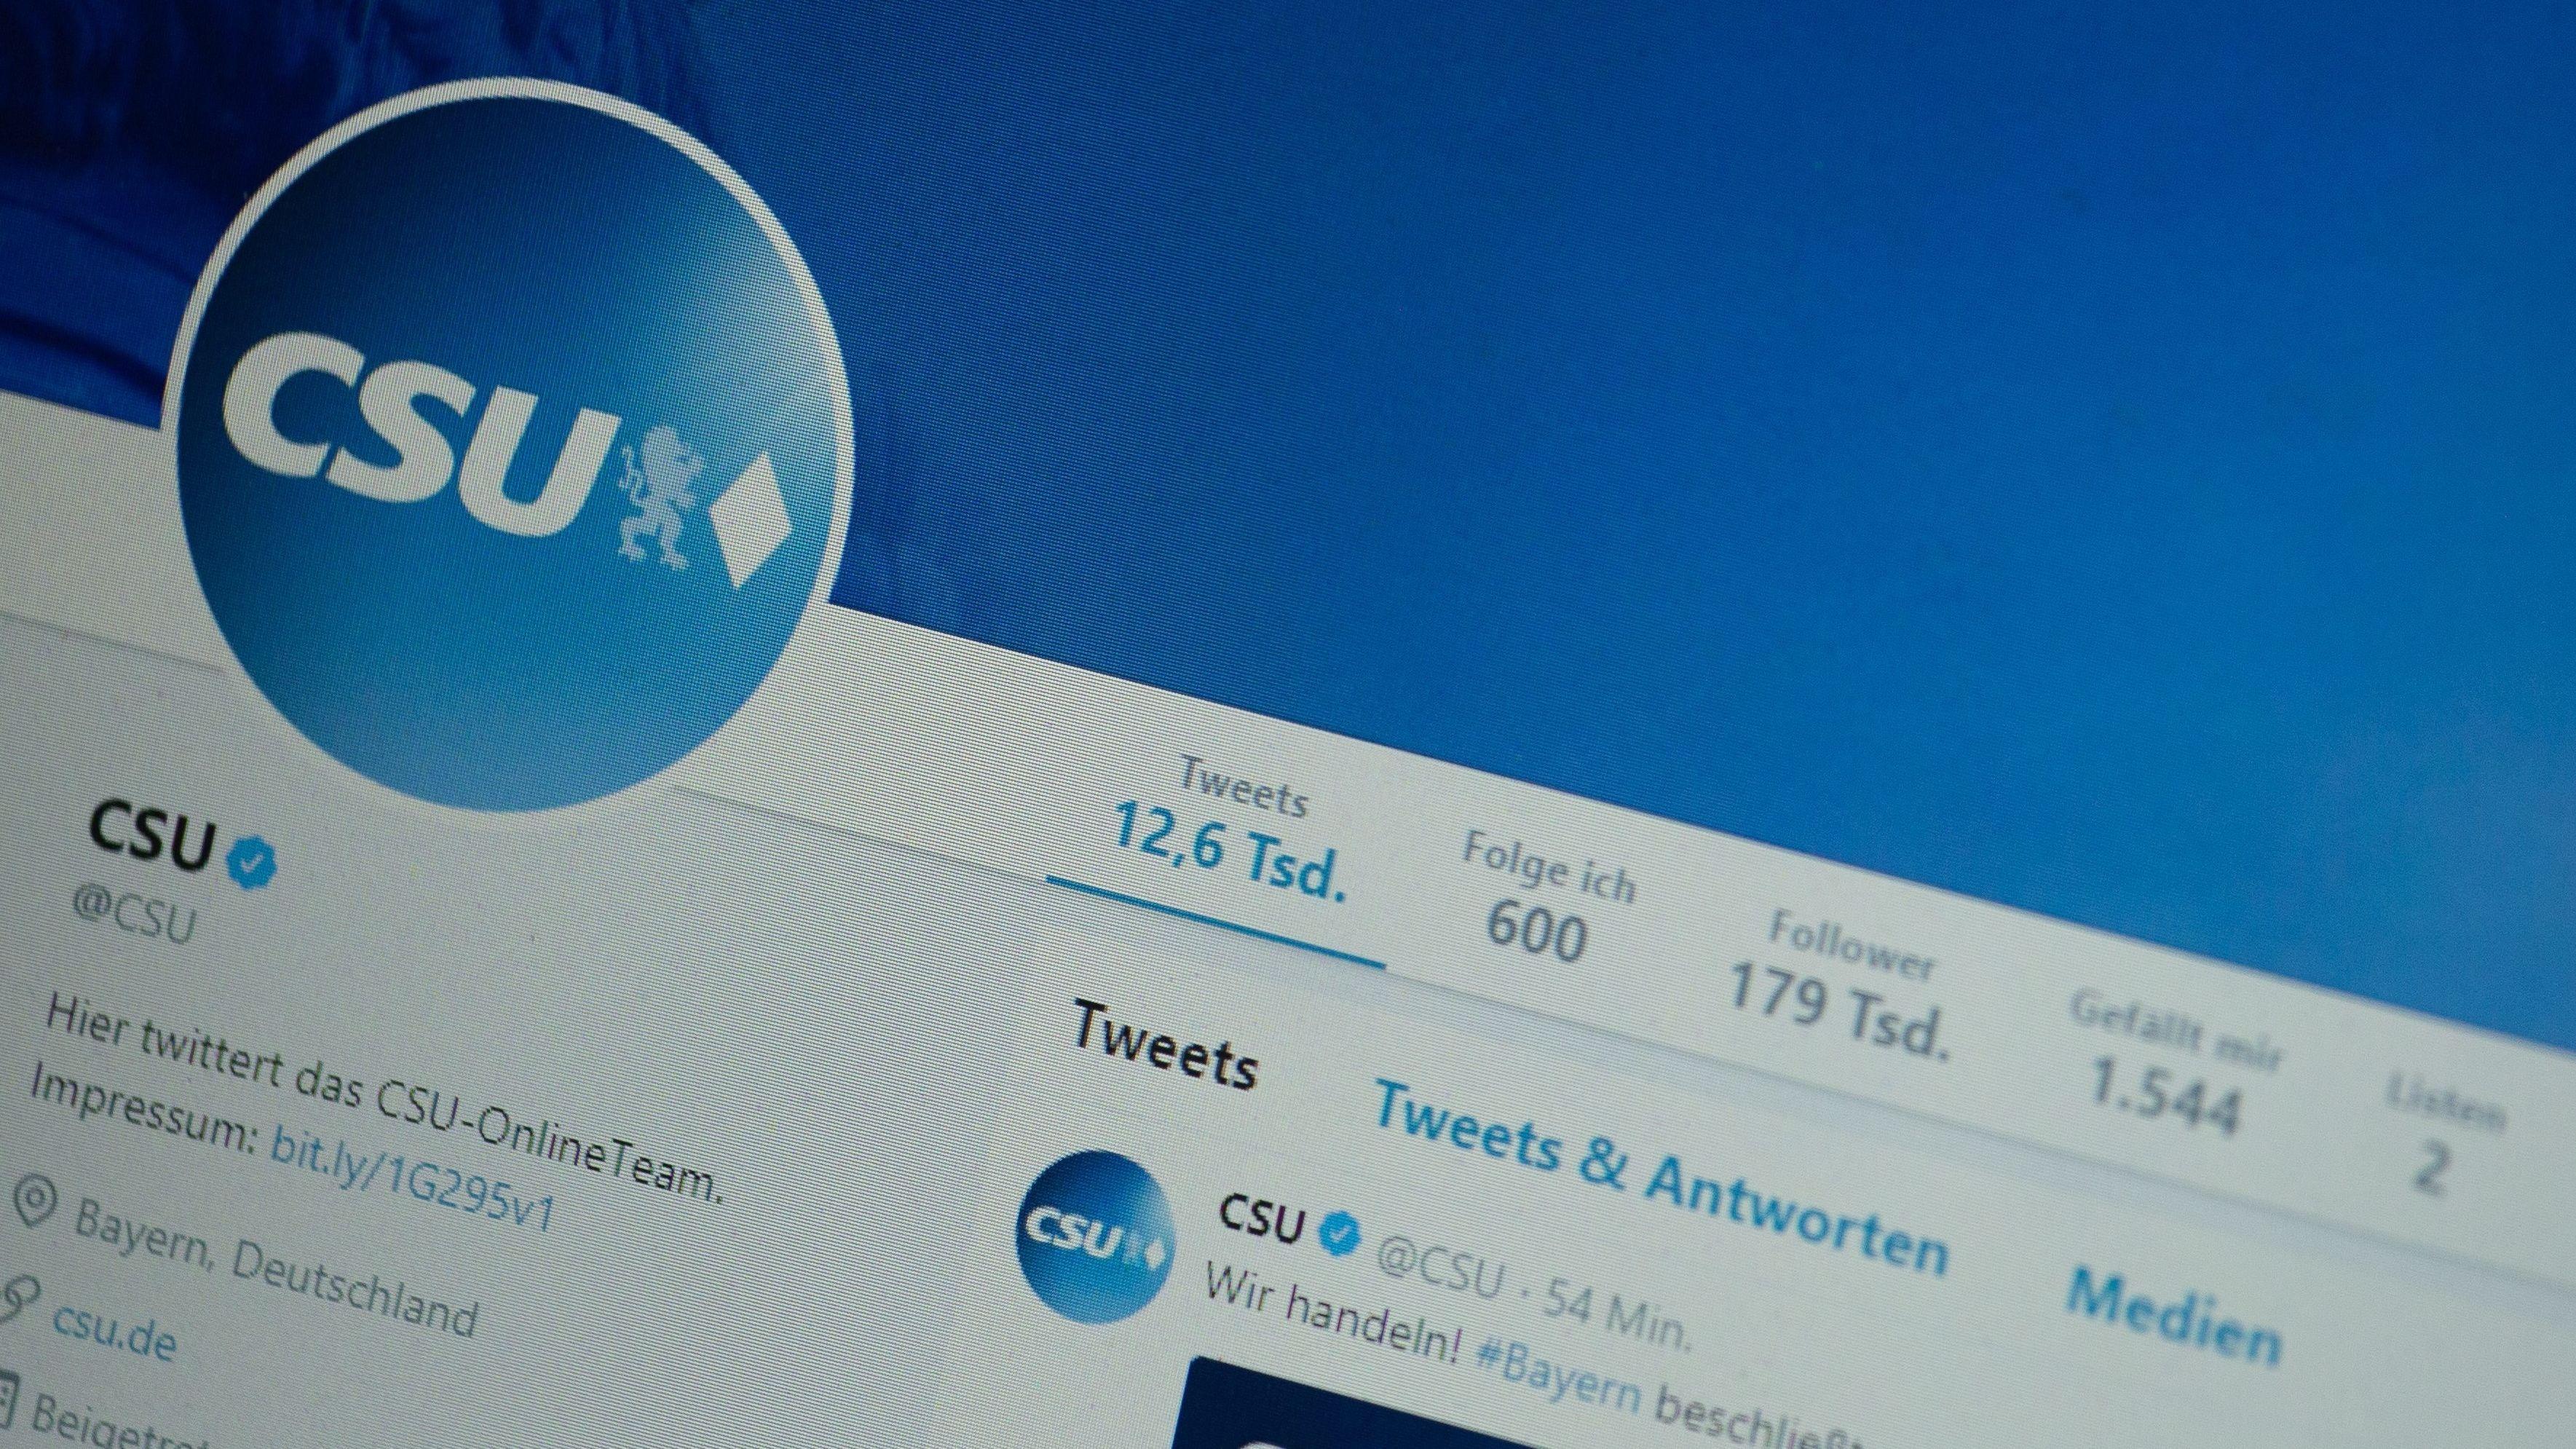 Symbolbild: CSU Twitter Account